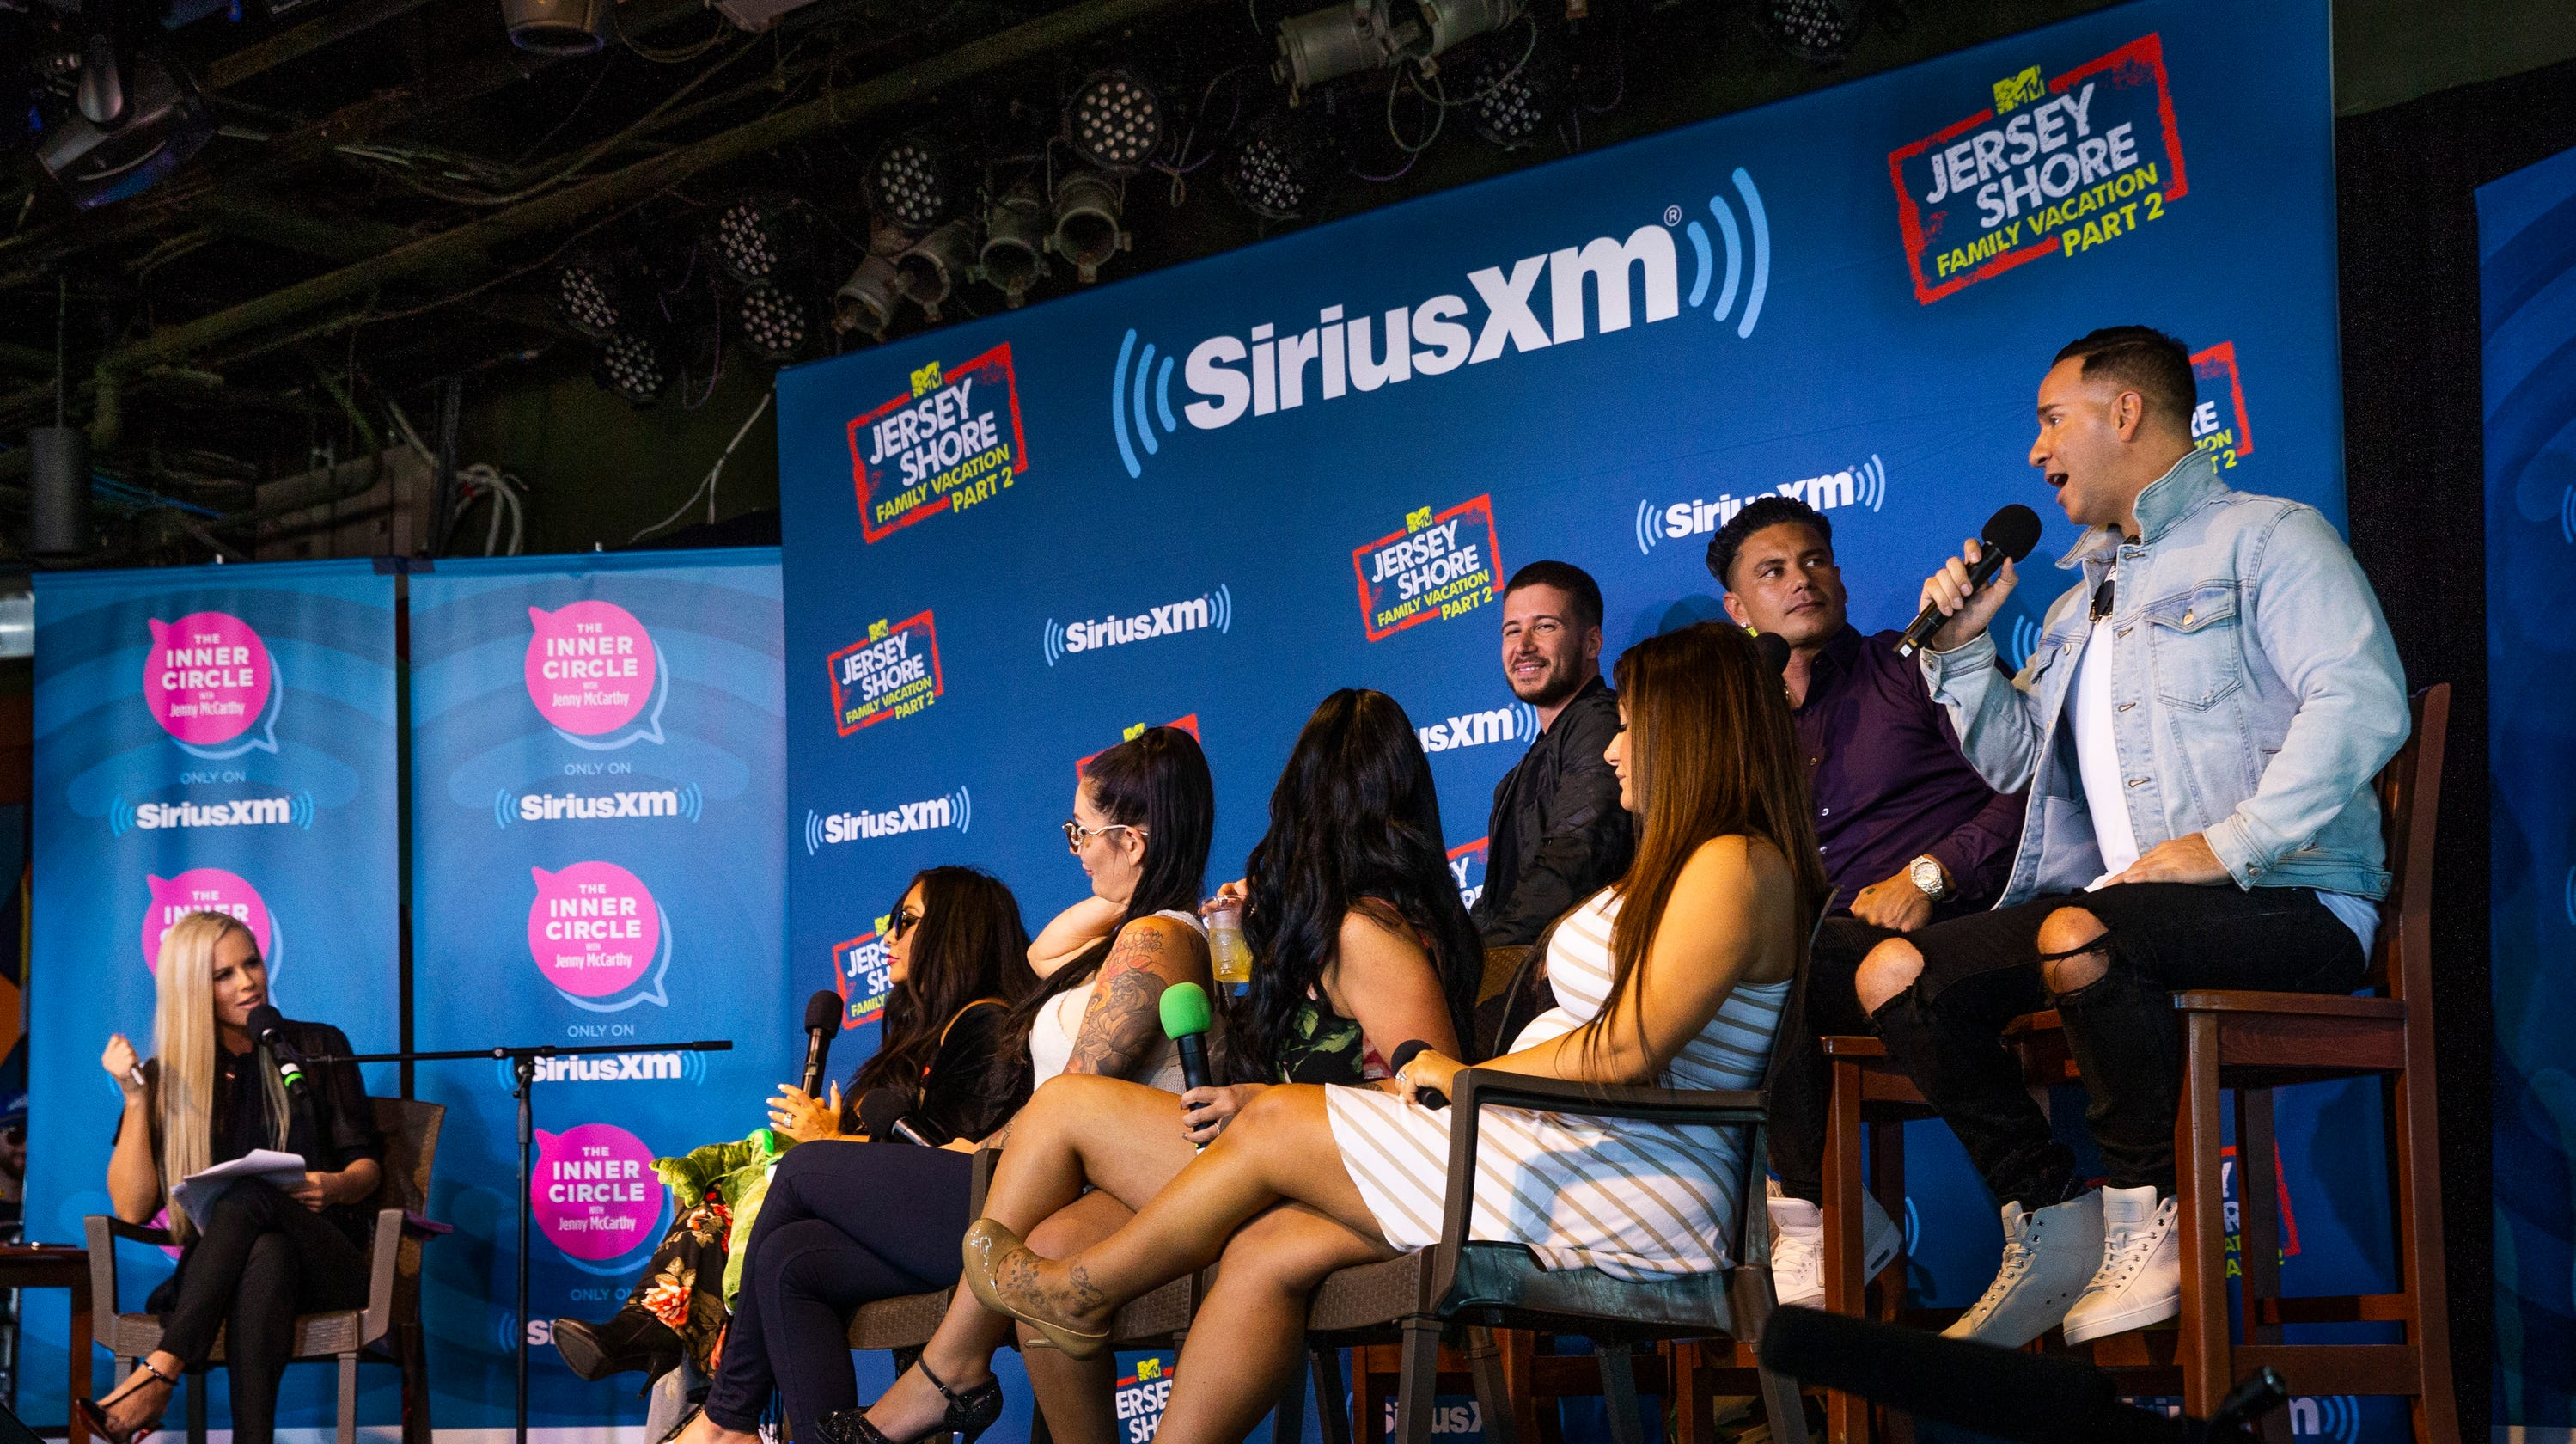 f415e8918d MTV  Jersey Shore Family Vacation   Cast hits Jenk s Nightclub on eve of  Season 2 debut